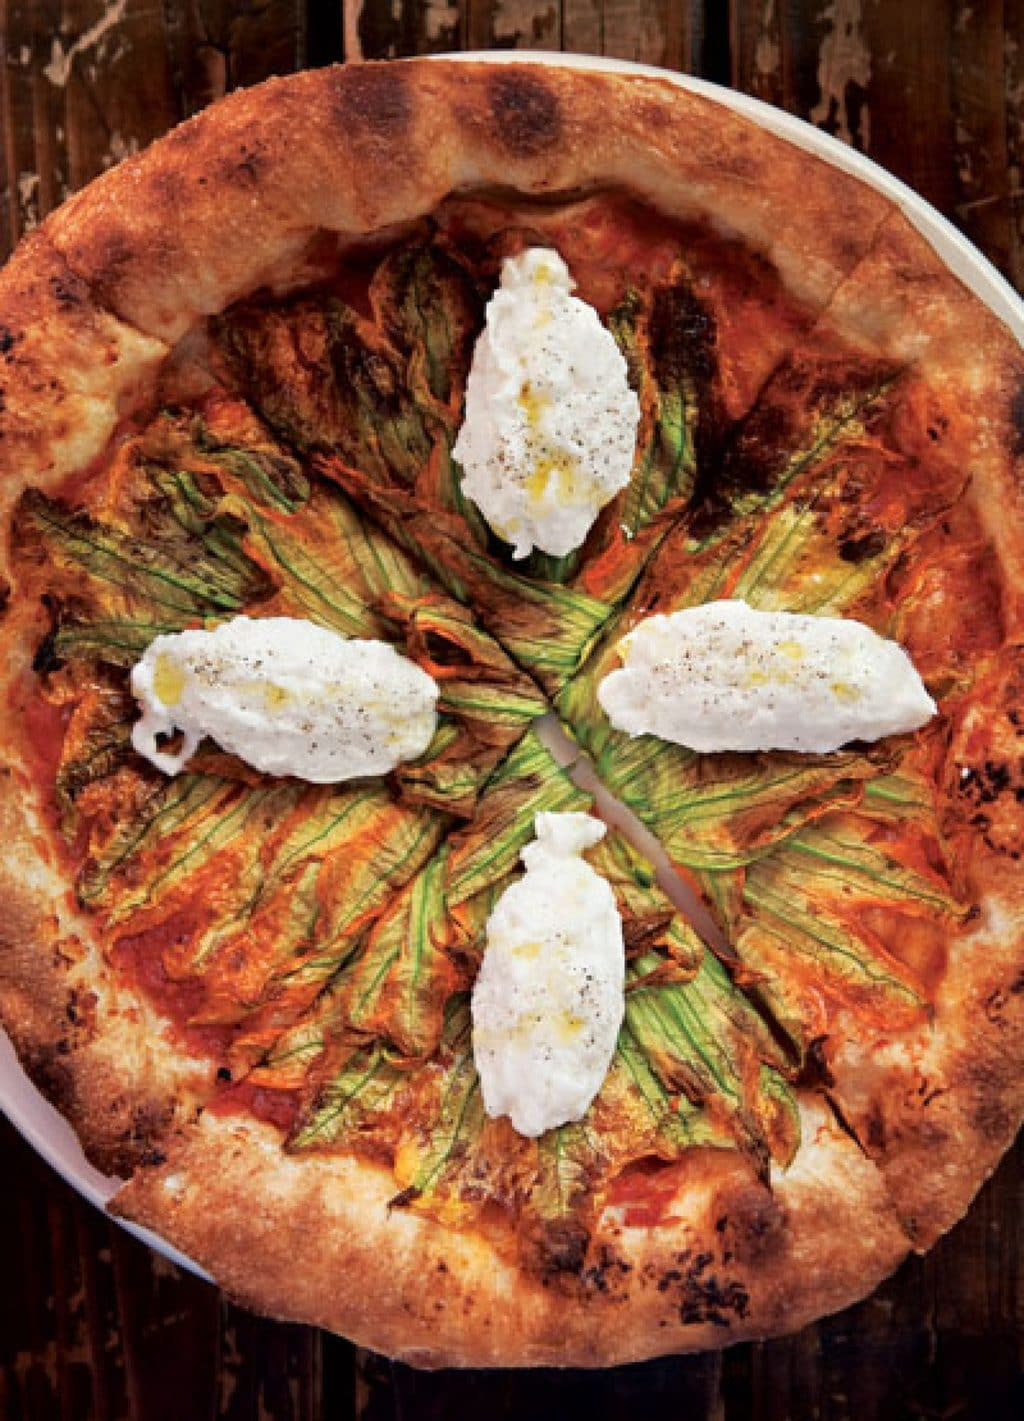 Squash Blossom pizza via Saveur